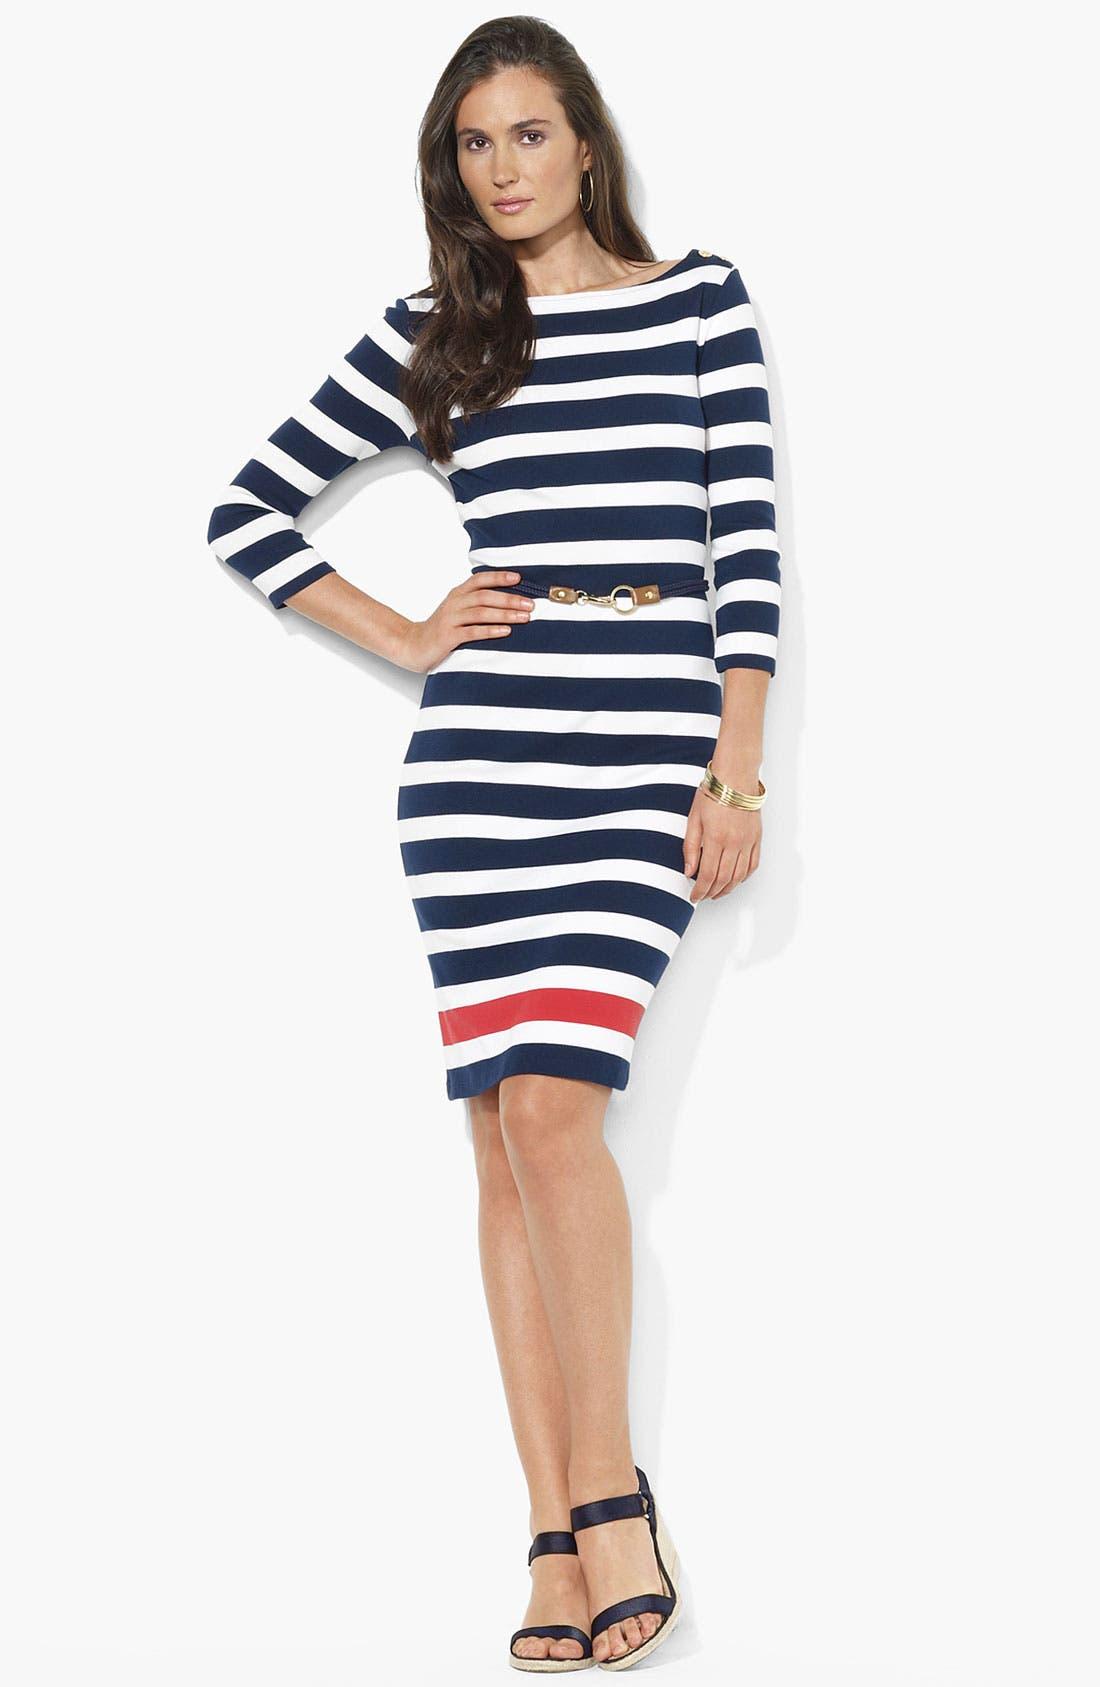 Button Shoulder Stripe Dress,                             Main thumbnail 1, color,                             Capri Navy/ White/ Cherry Red